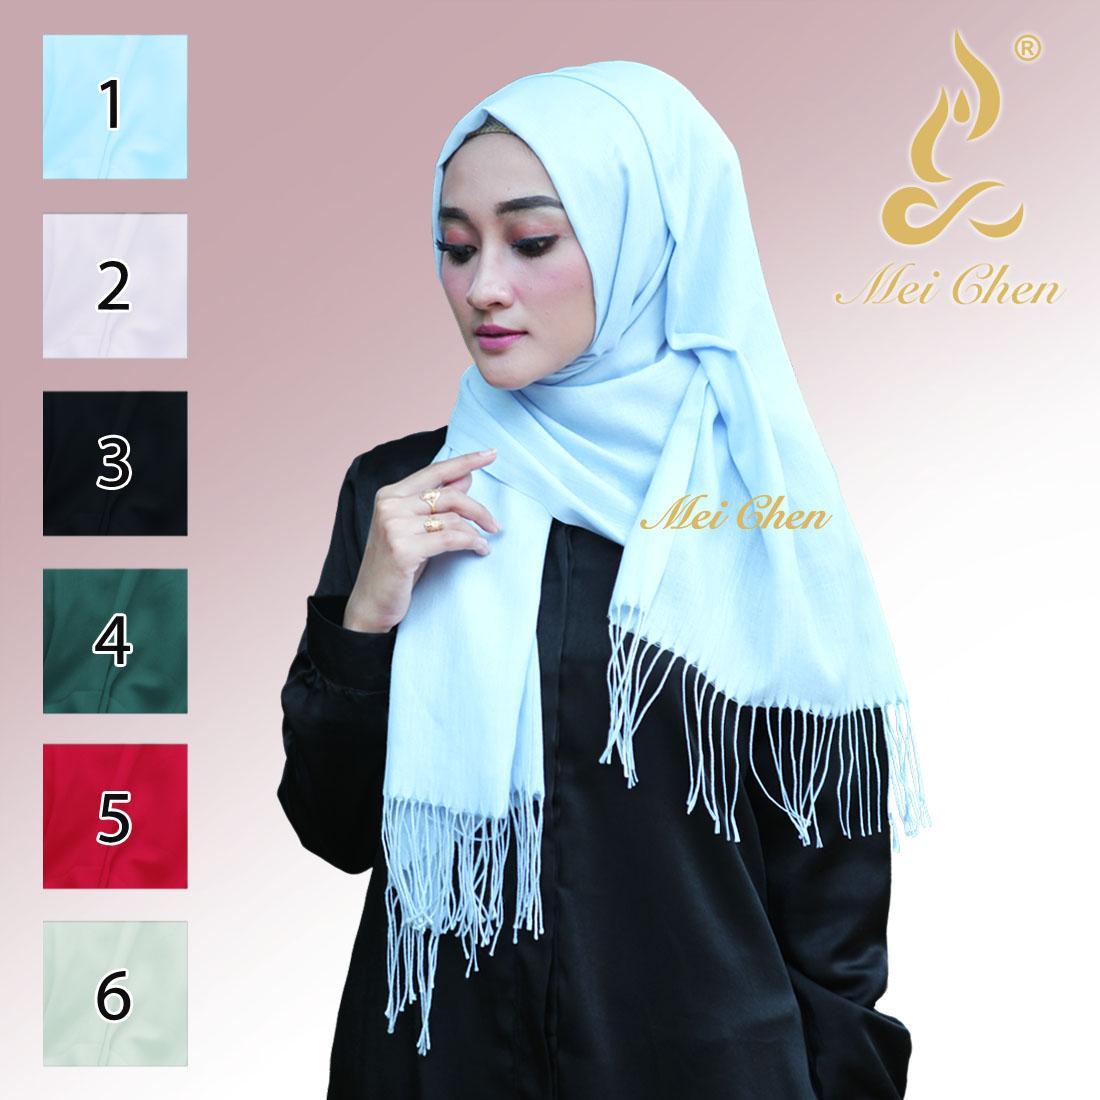 mei chen pashmina cashmere polos hijab jilbab kerudung pasmina rectangle